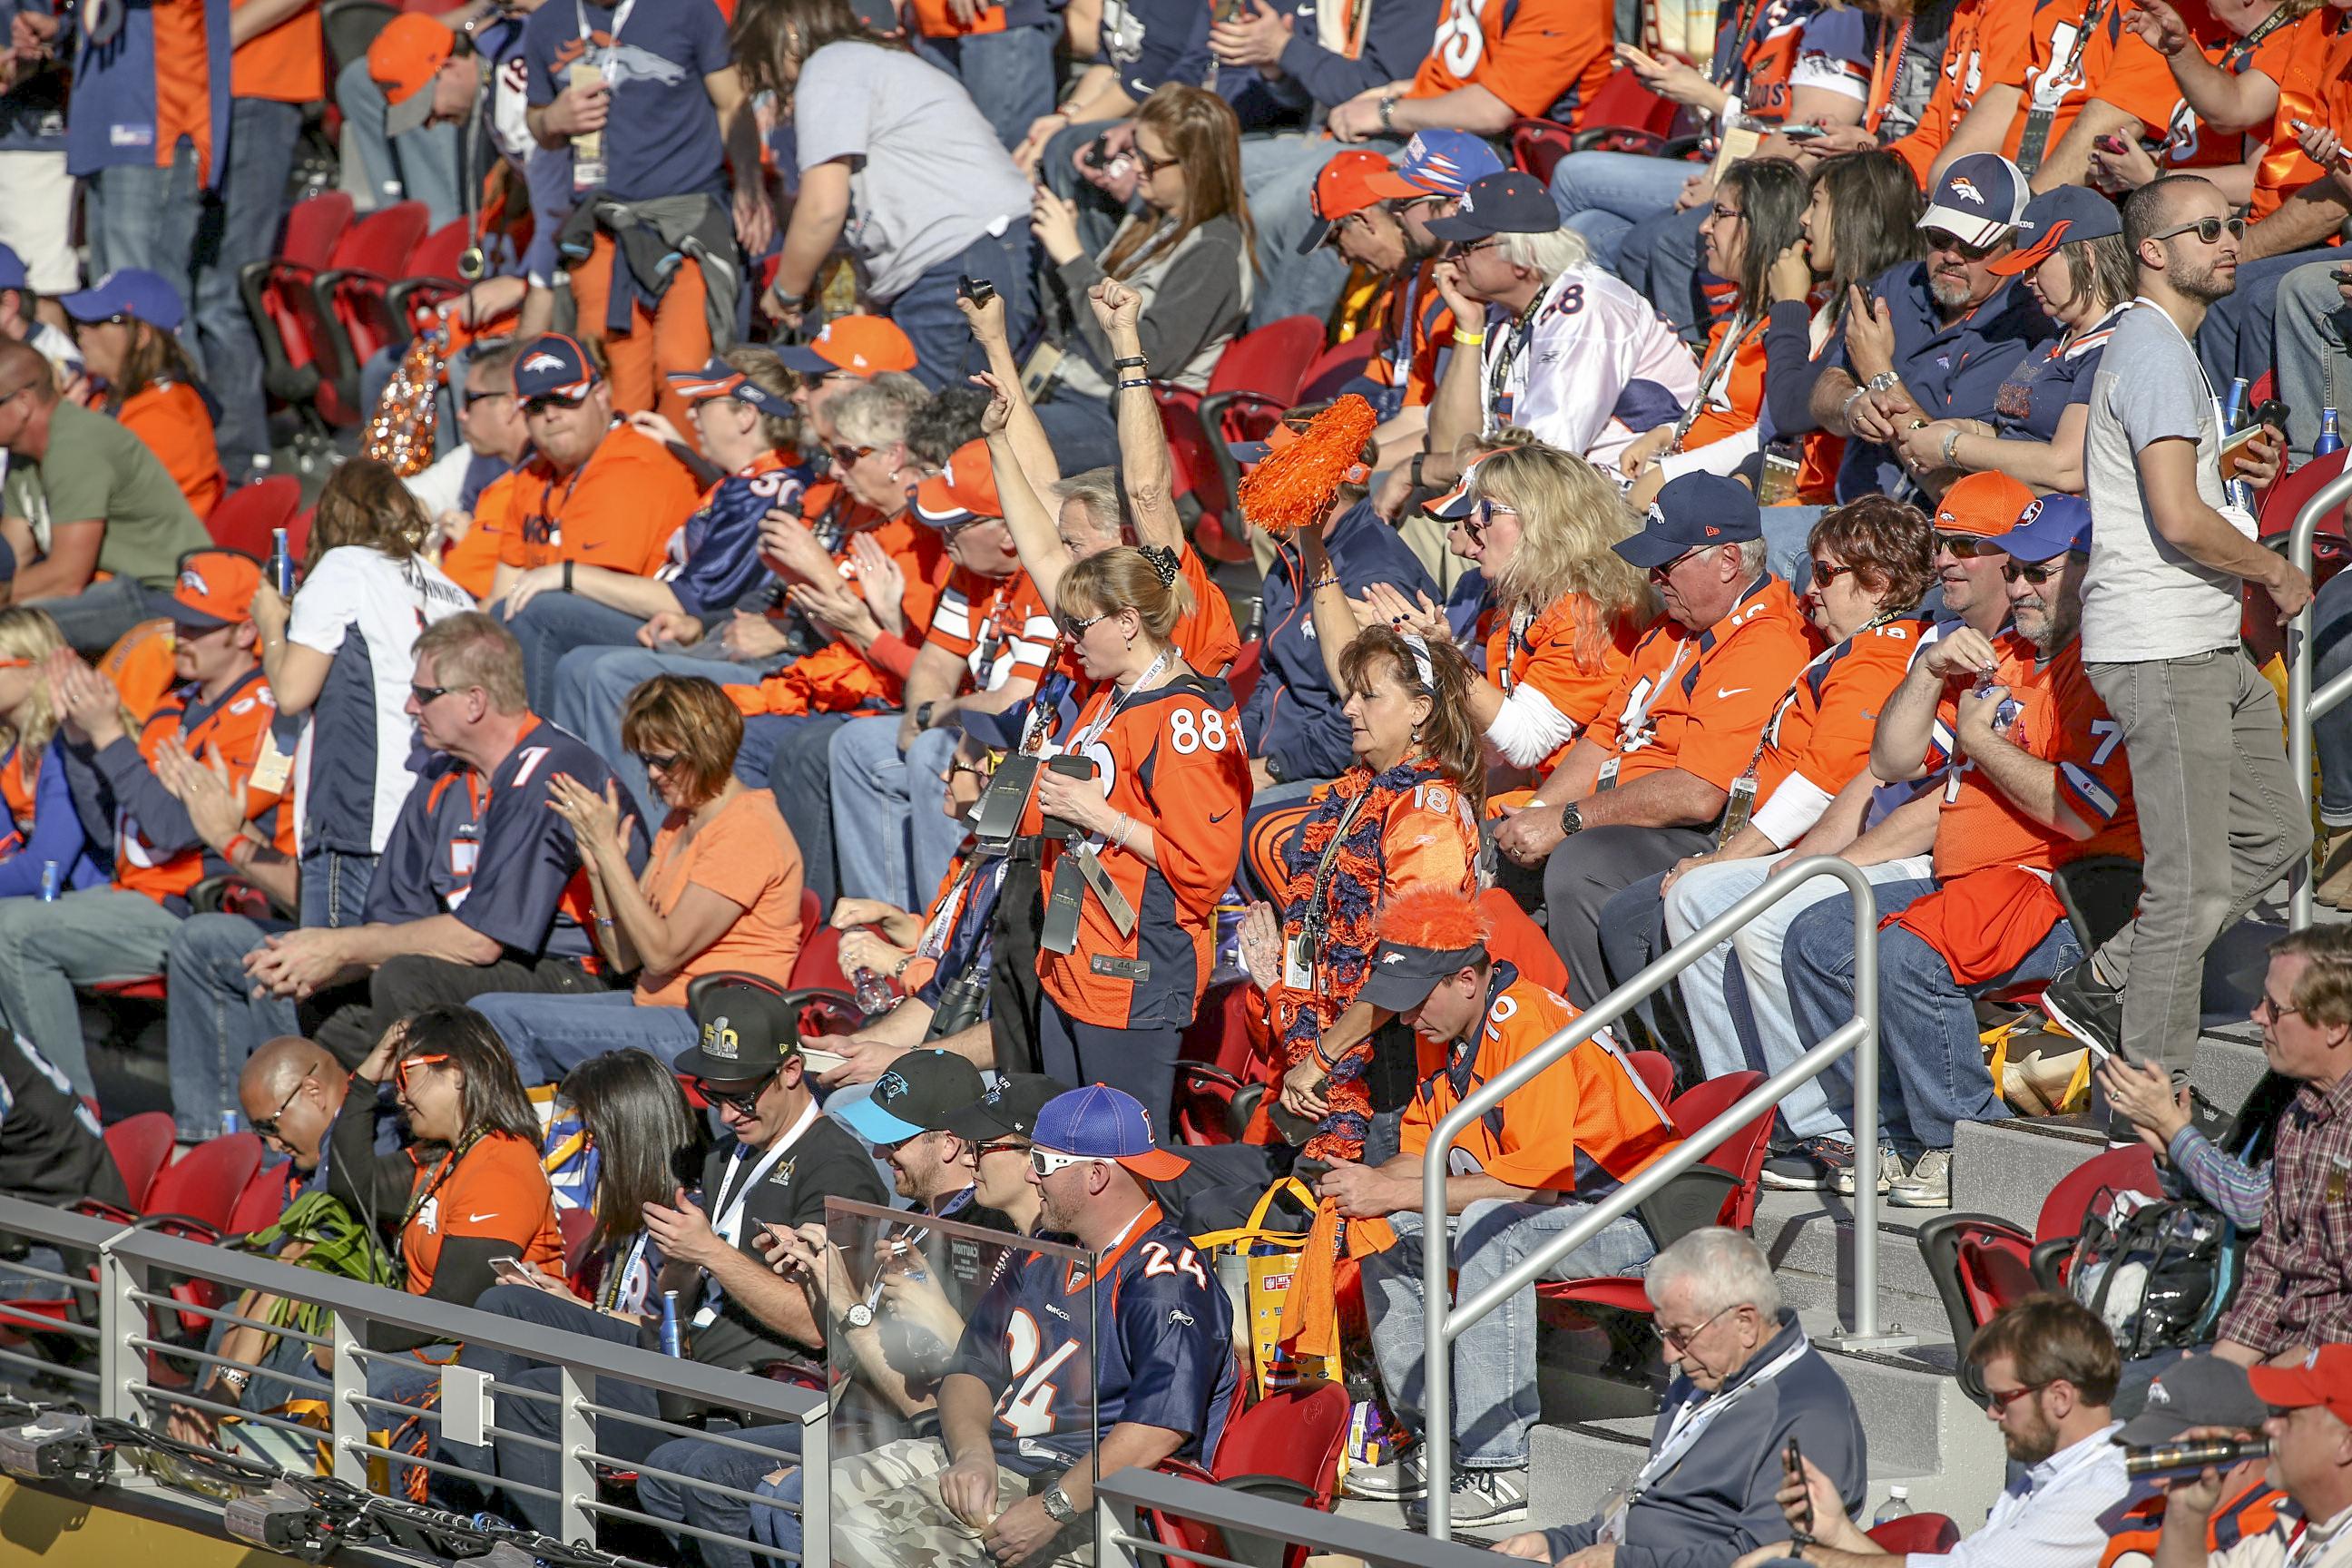 020716-Broncosfans-stands